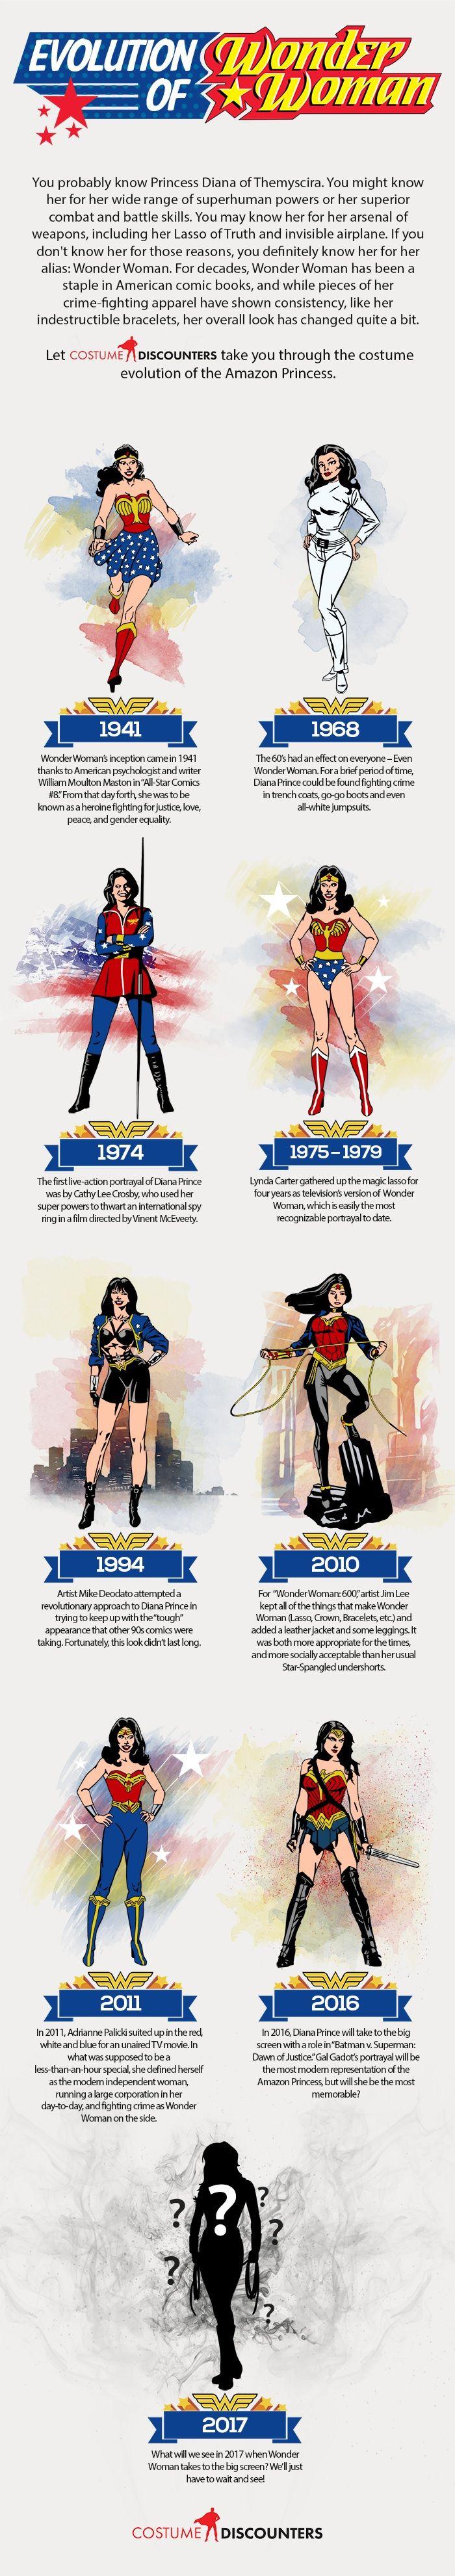 Infographic: Wonder Woman's Costume Evolution — GeekTyrant